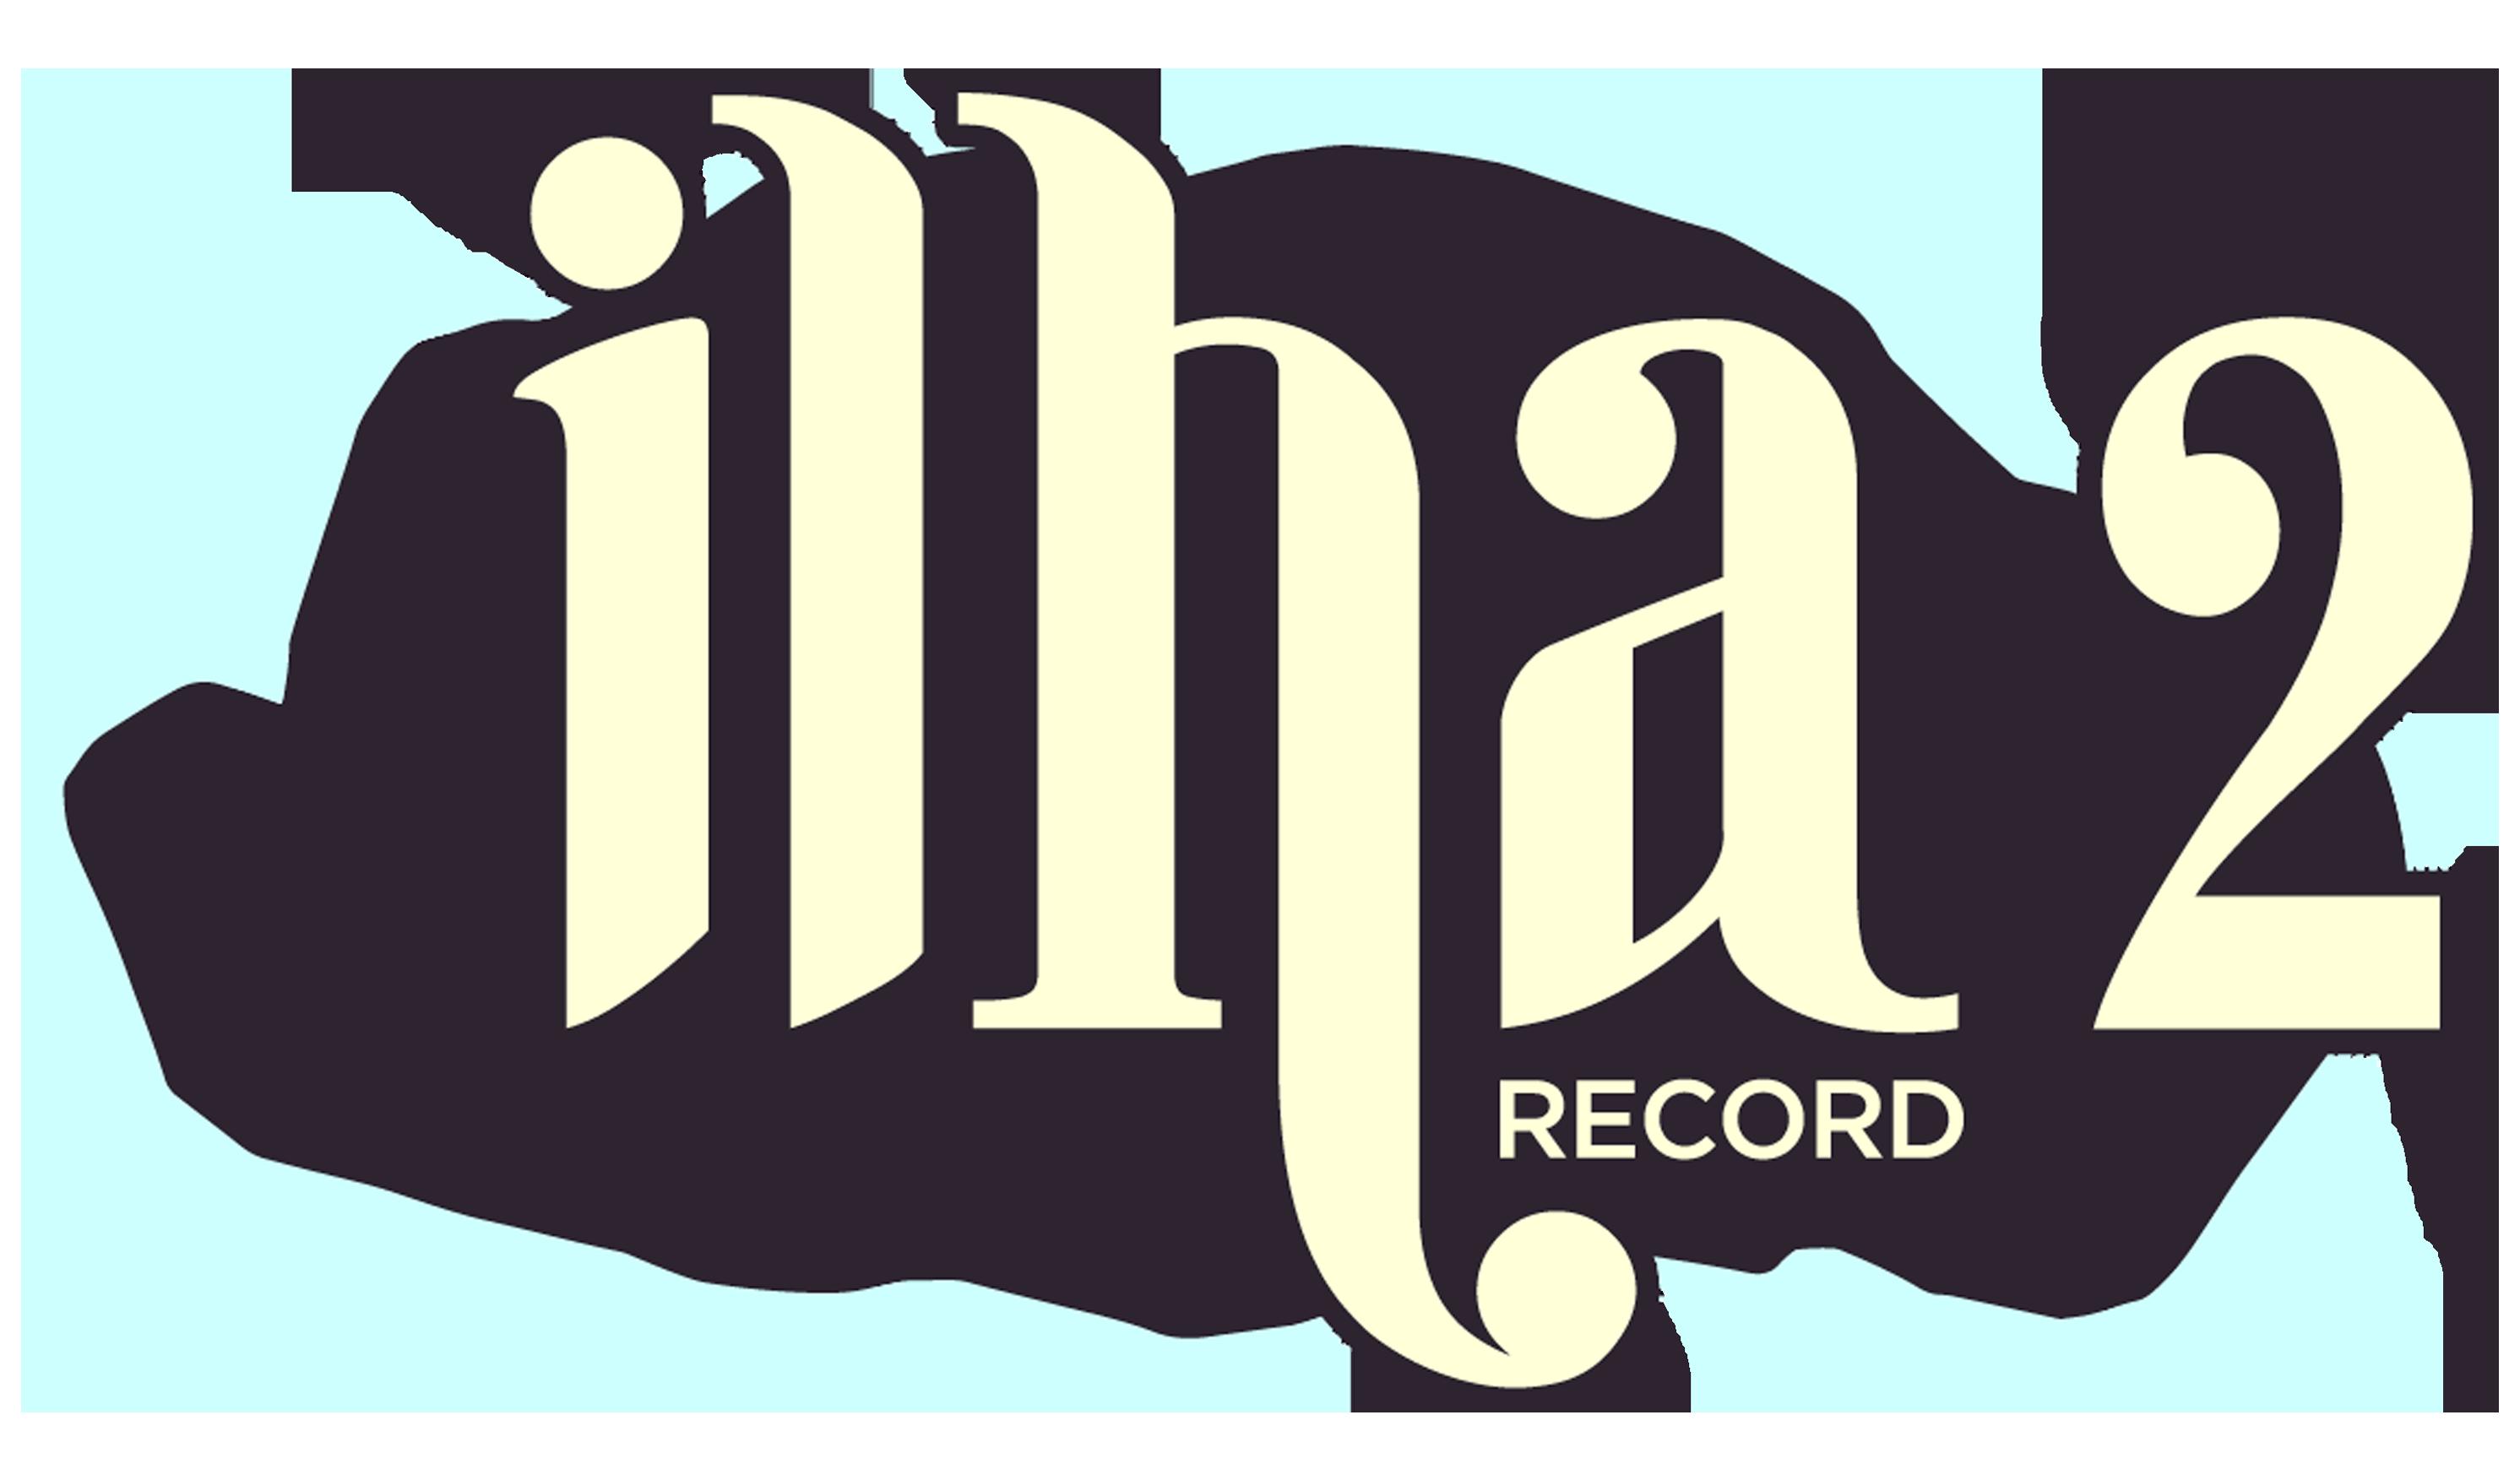 - Ilha Record